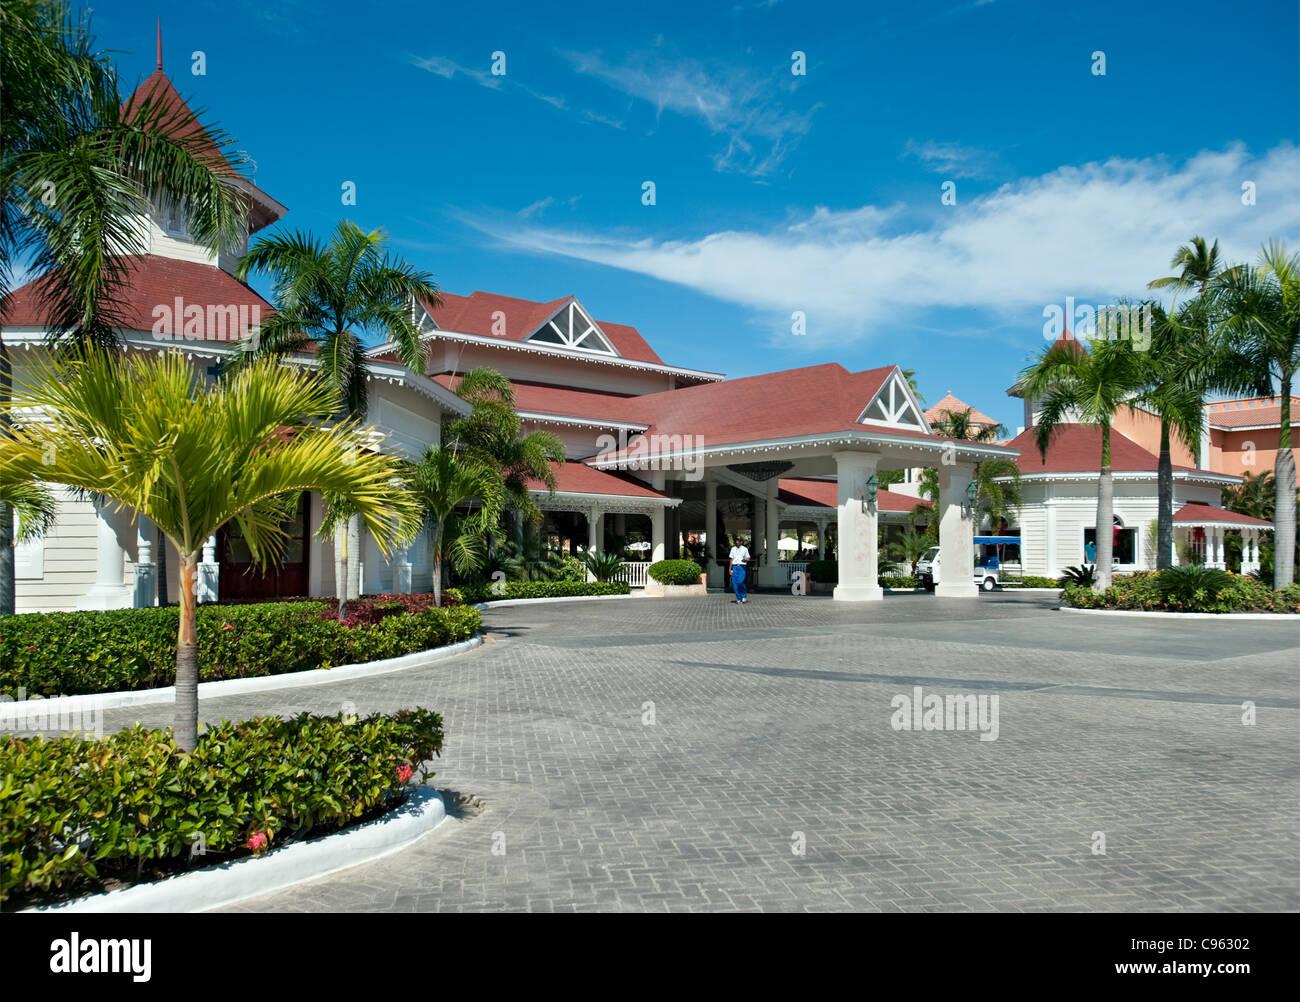 Gran Bahia Principe Ambar Hotel, Punta Cana, República Dominicana Imagen De Stock